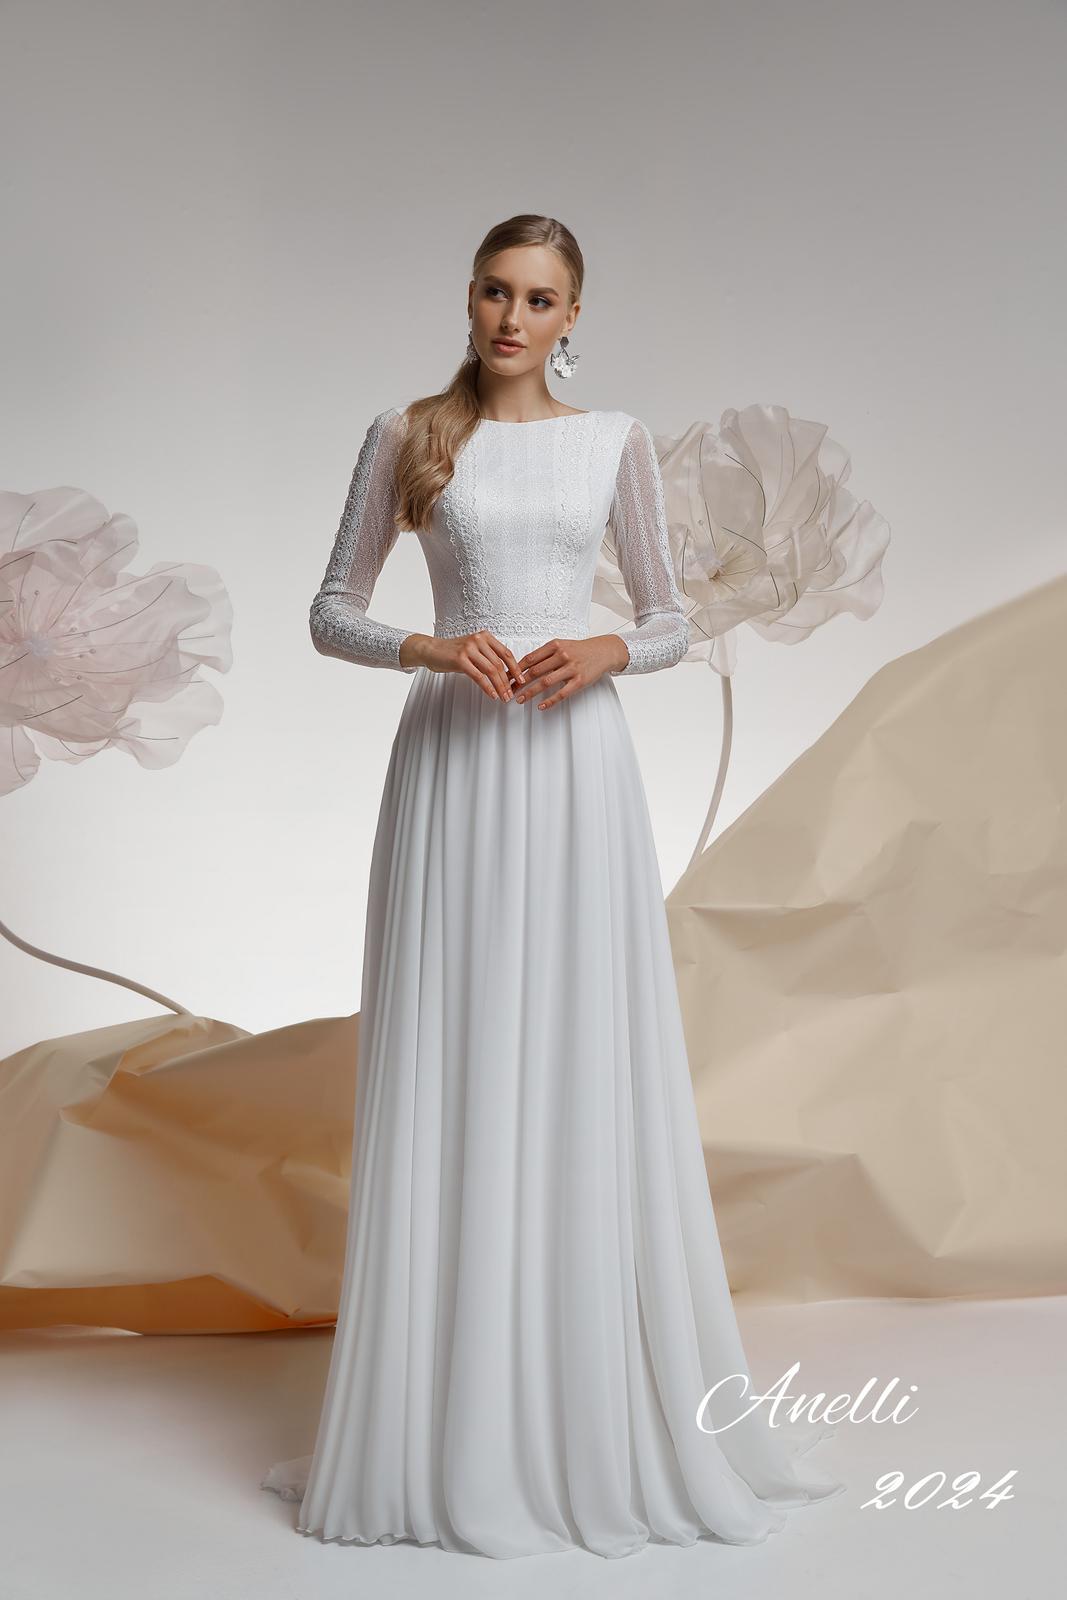 Svadobné šaty - Imagine 2024 - Obrázok č. 1